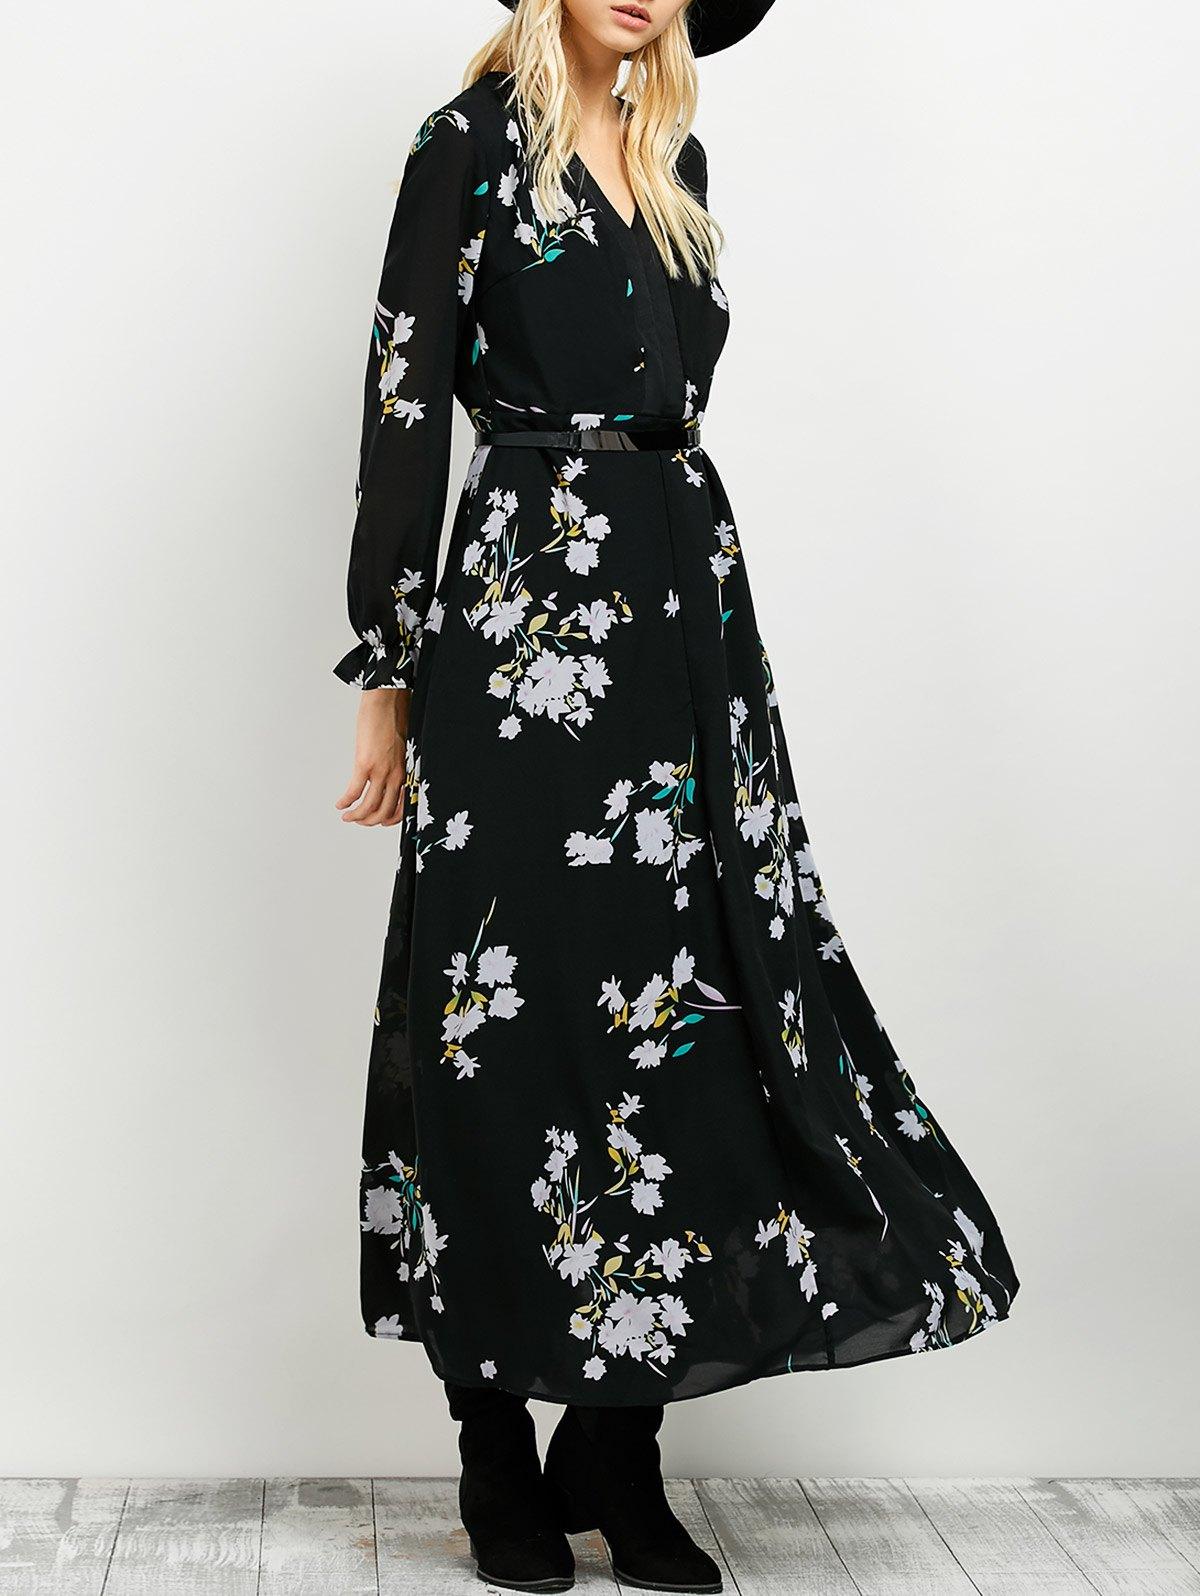 Floral Print Flowing Maxi Dress